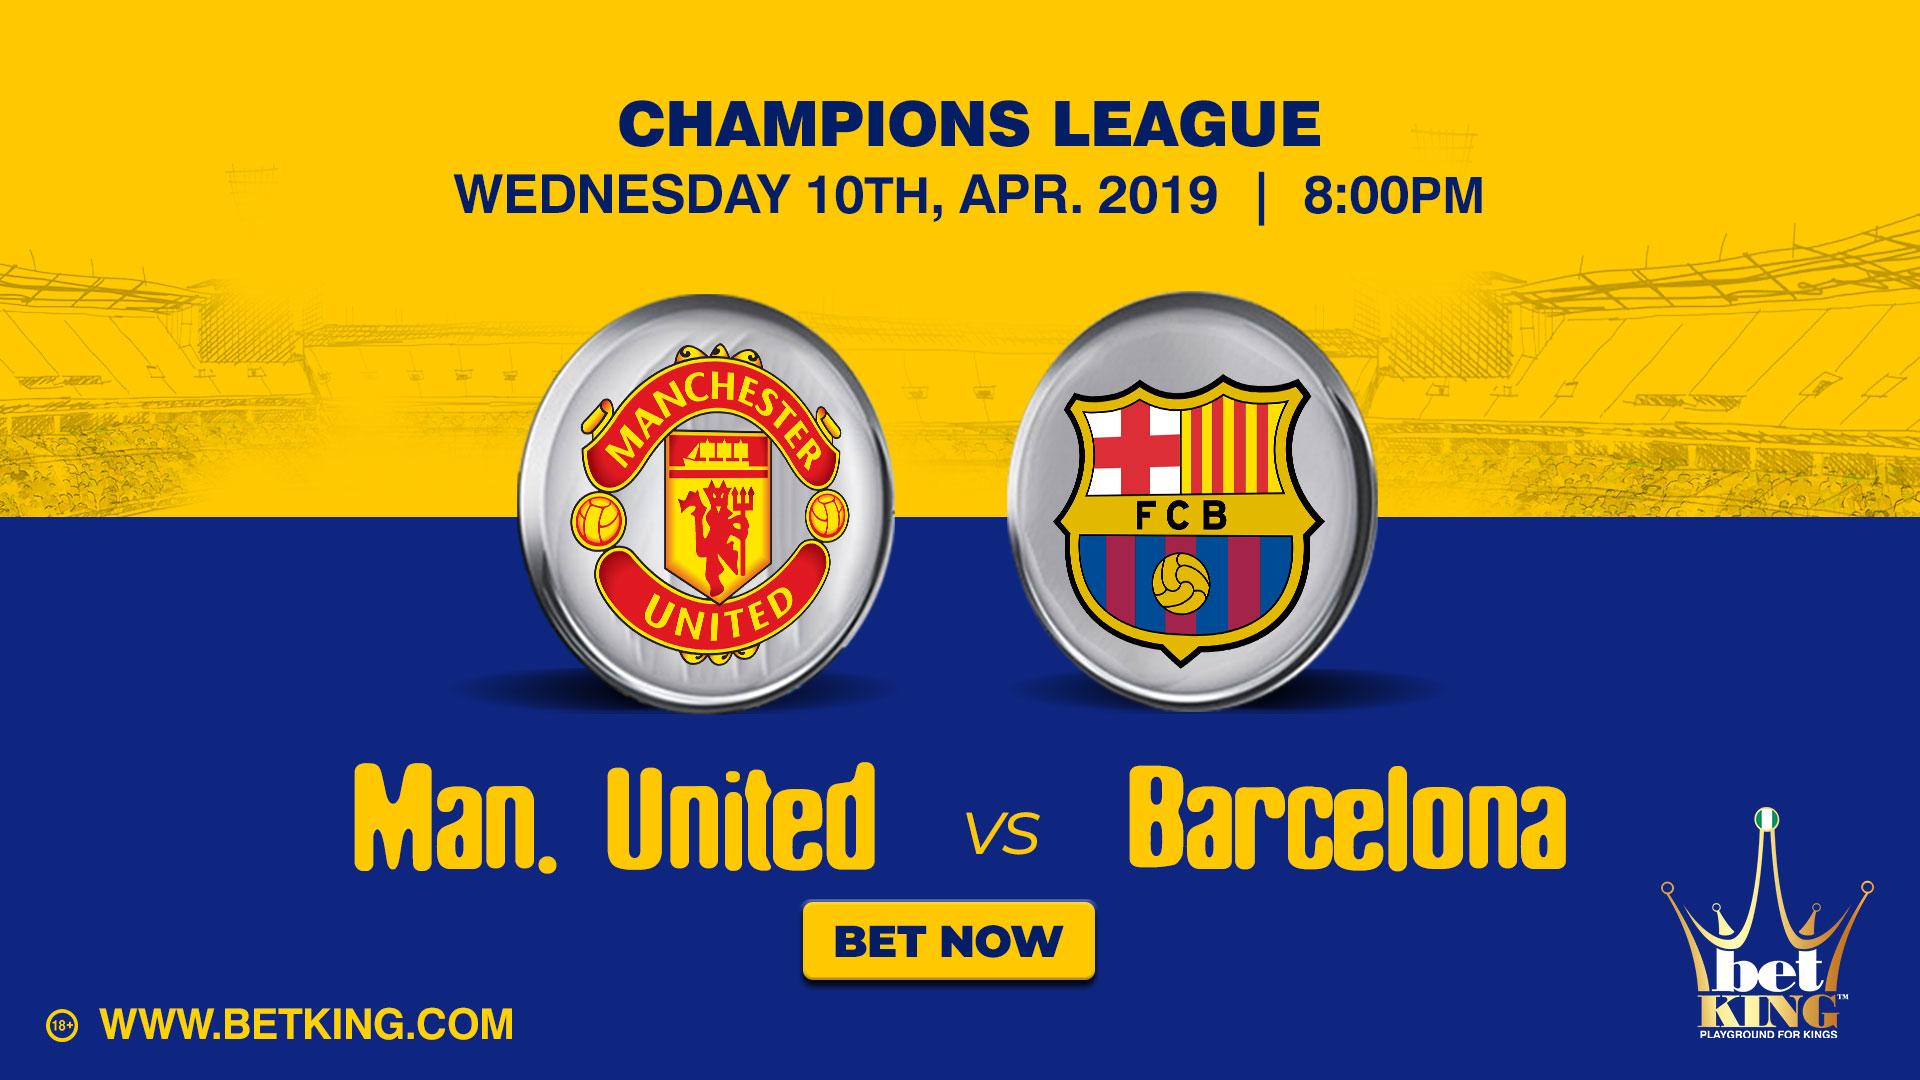 Betking Man United Barcelona